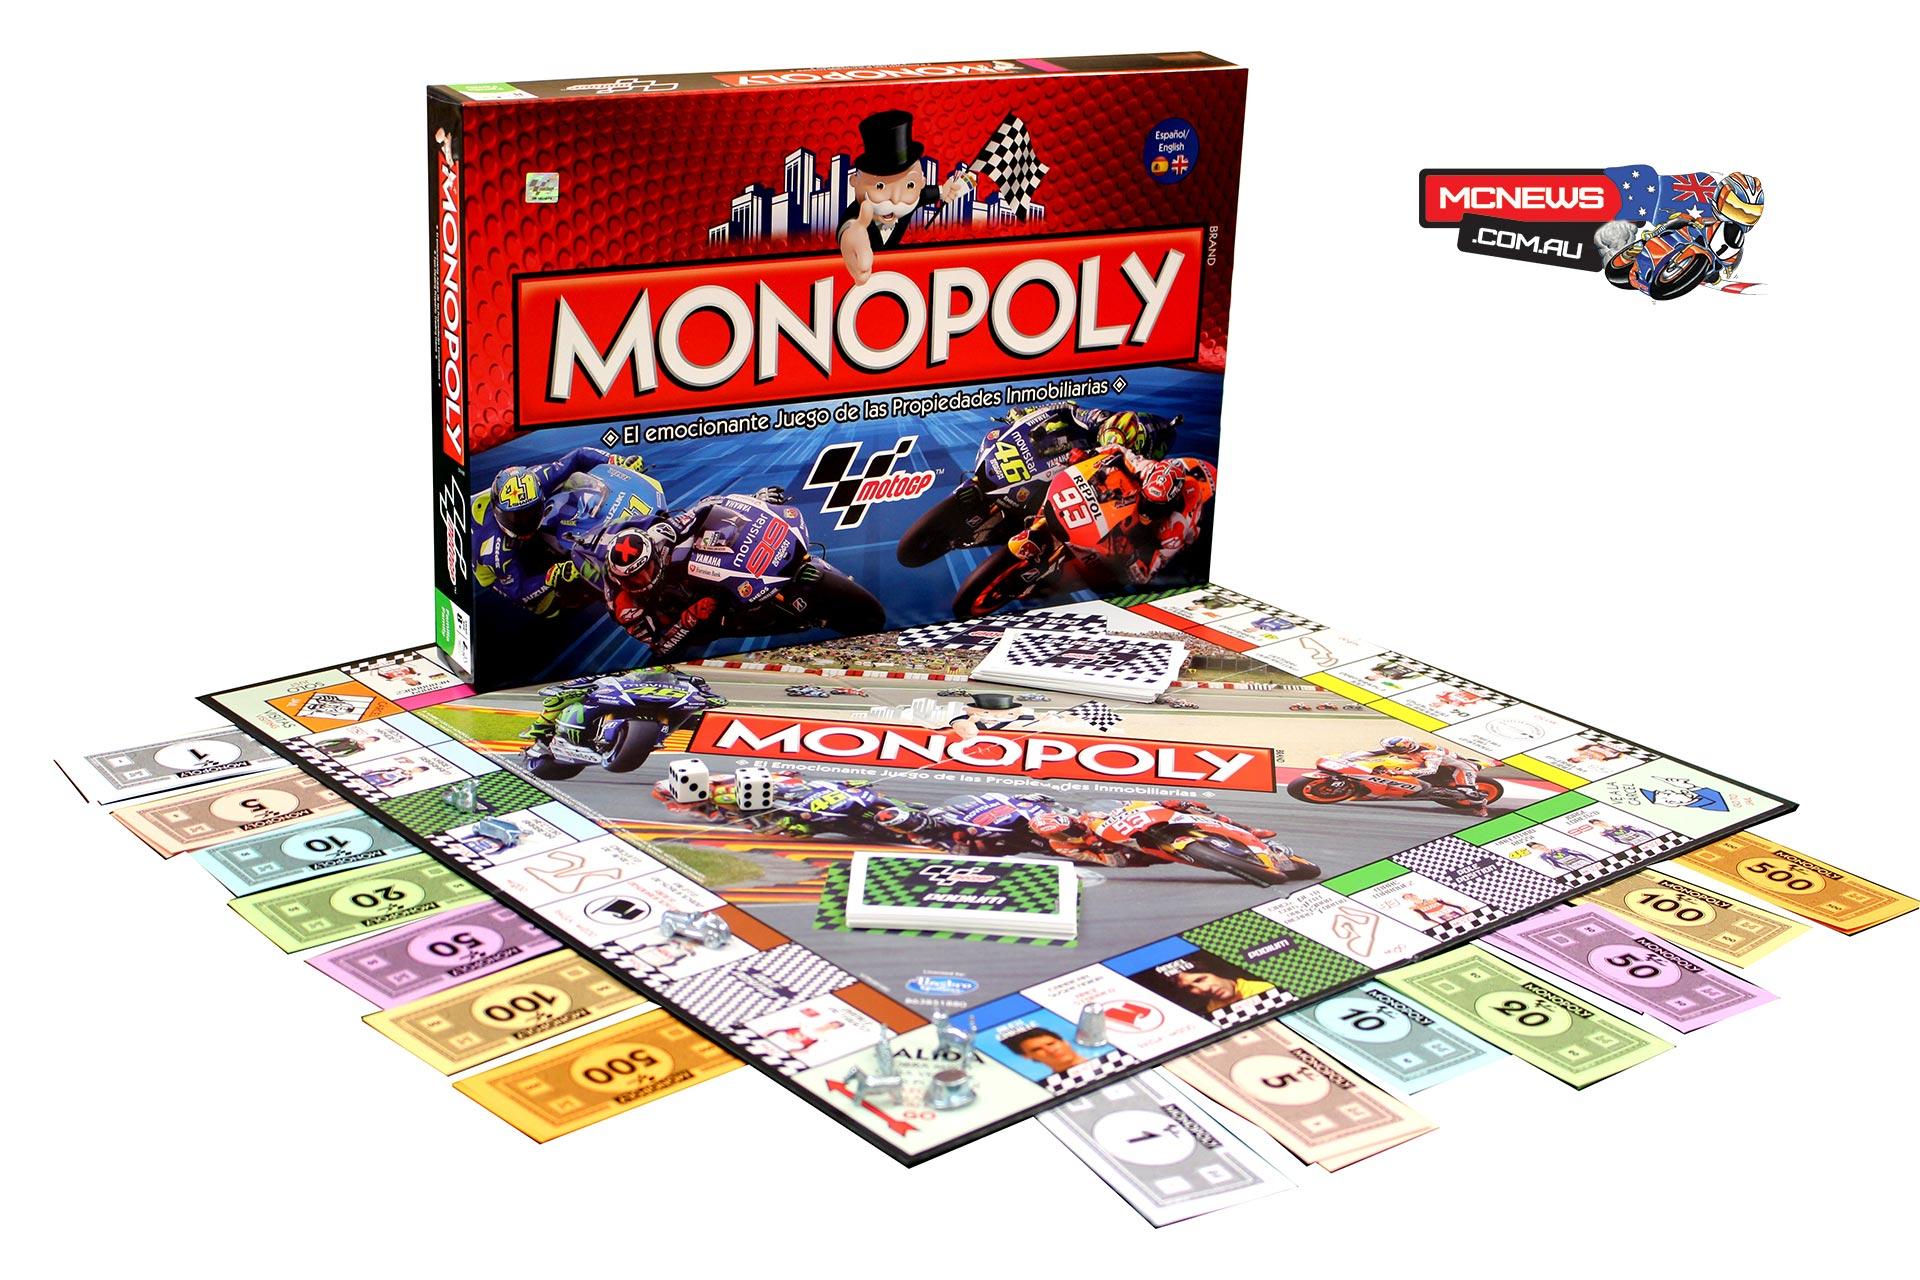 MotoGP Monopoly Edition